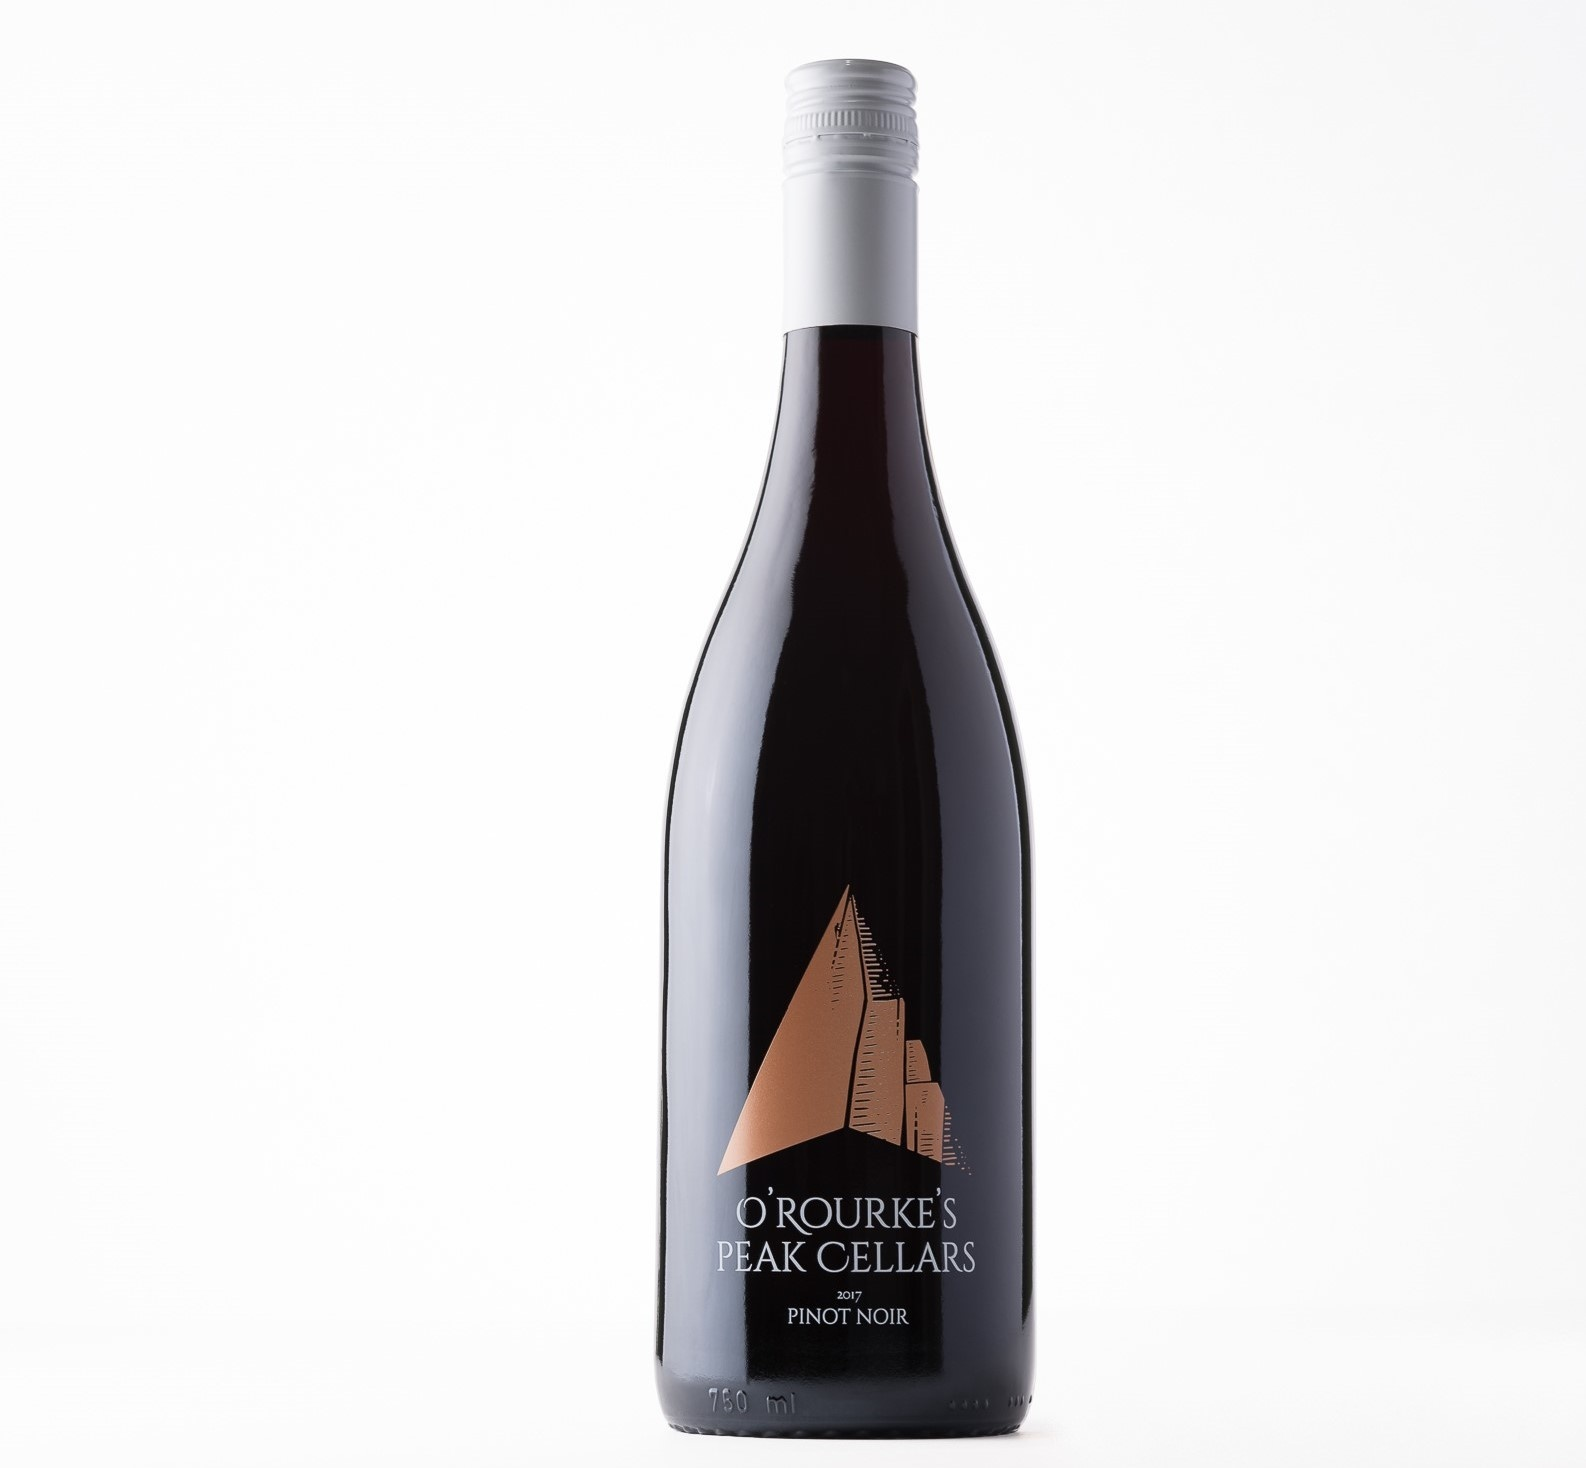 O'Rourke's Peak Cellars 2018 Pinot Noir